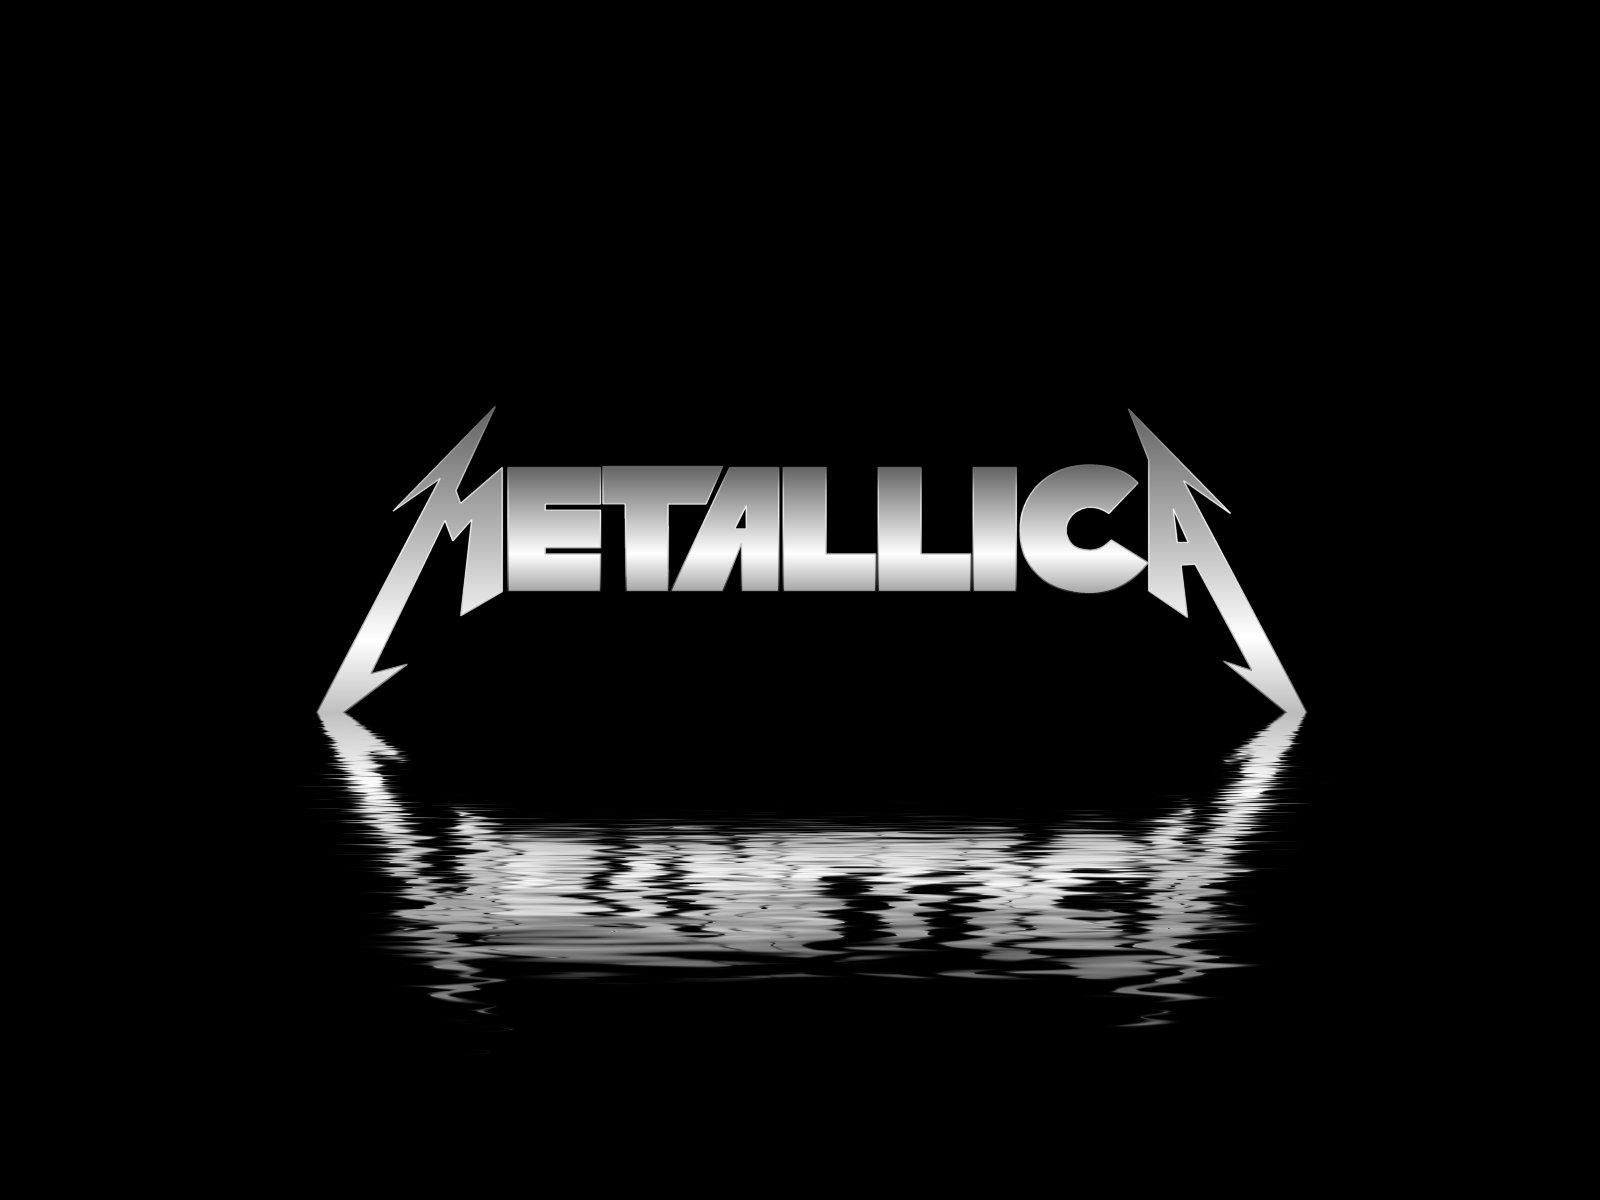 Meallica metallica photo 30286039 fanpop for Classic house music albums